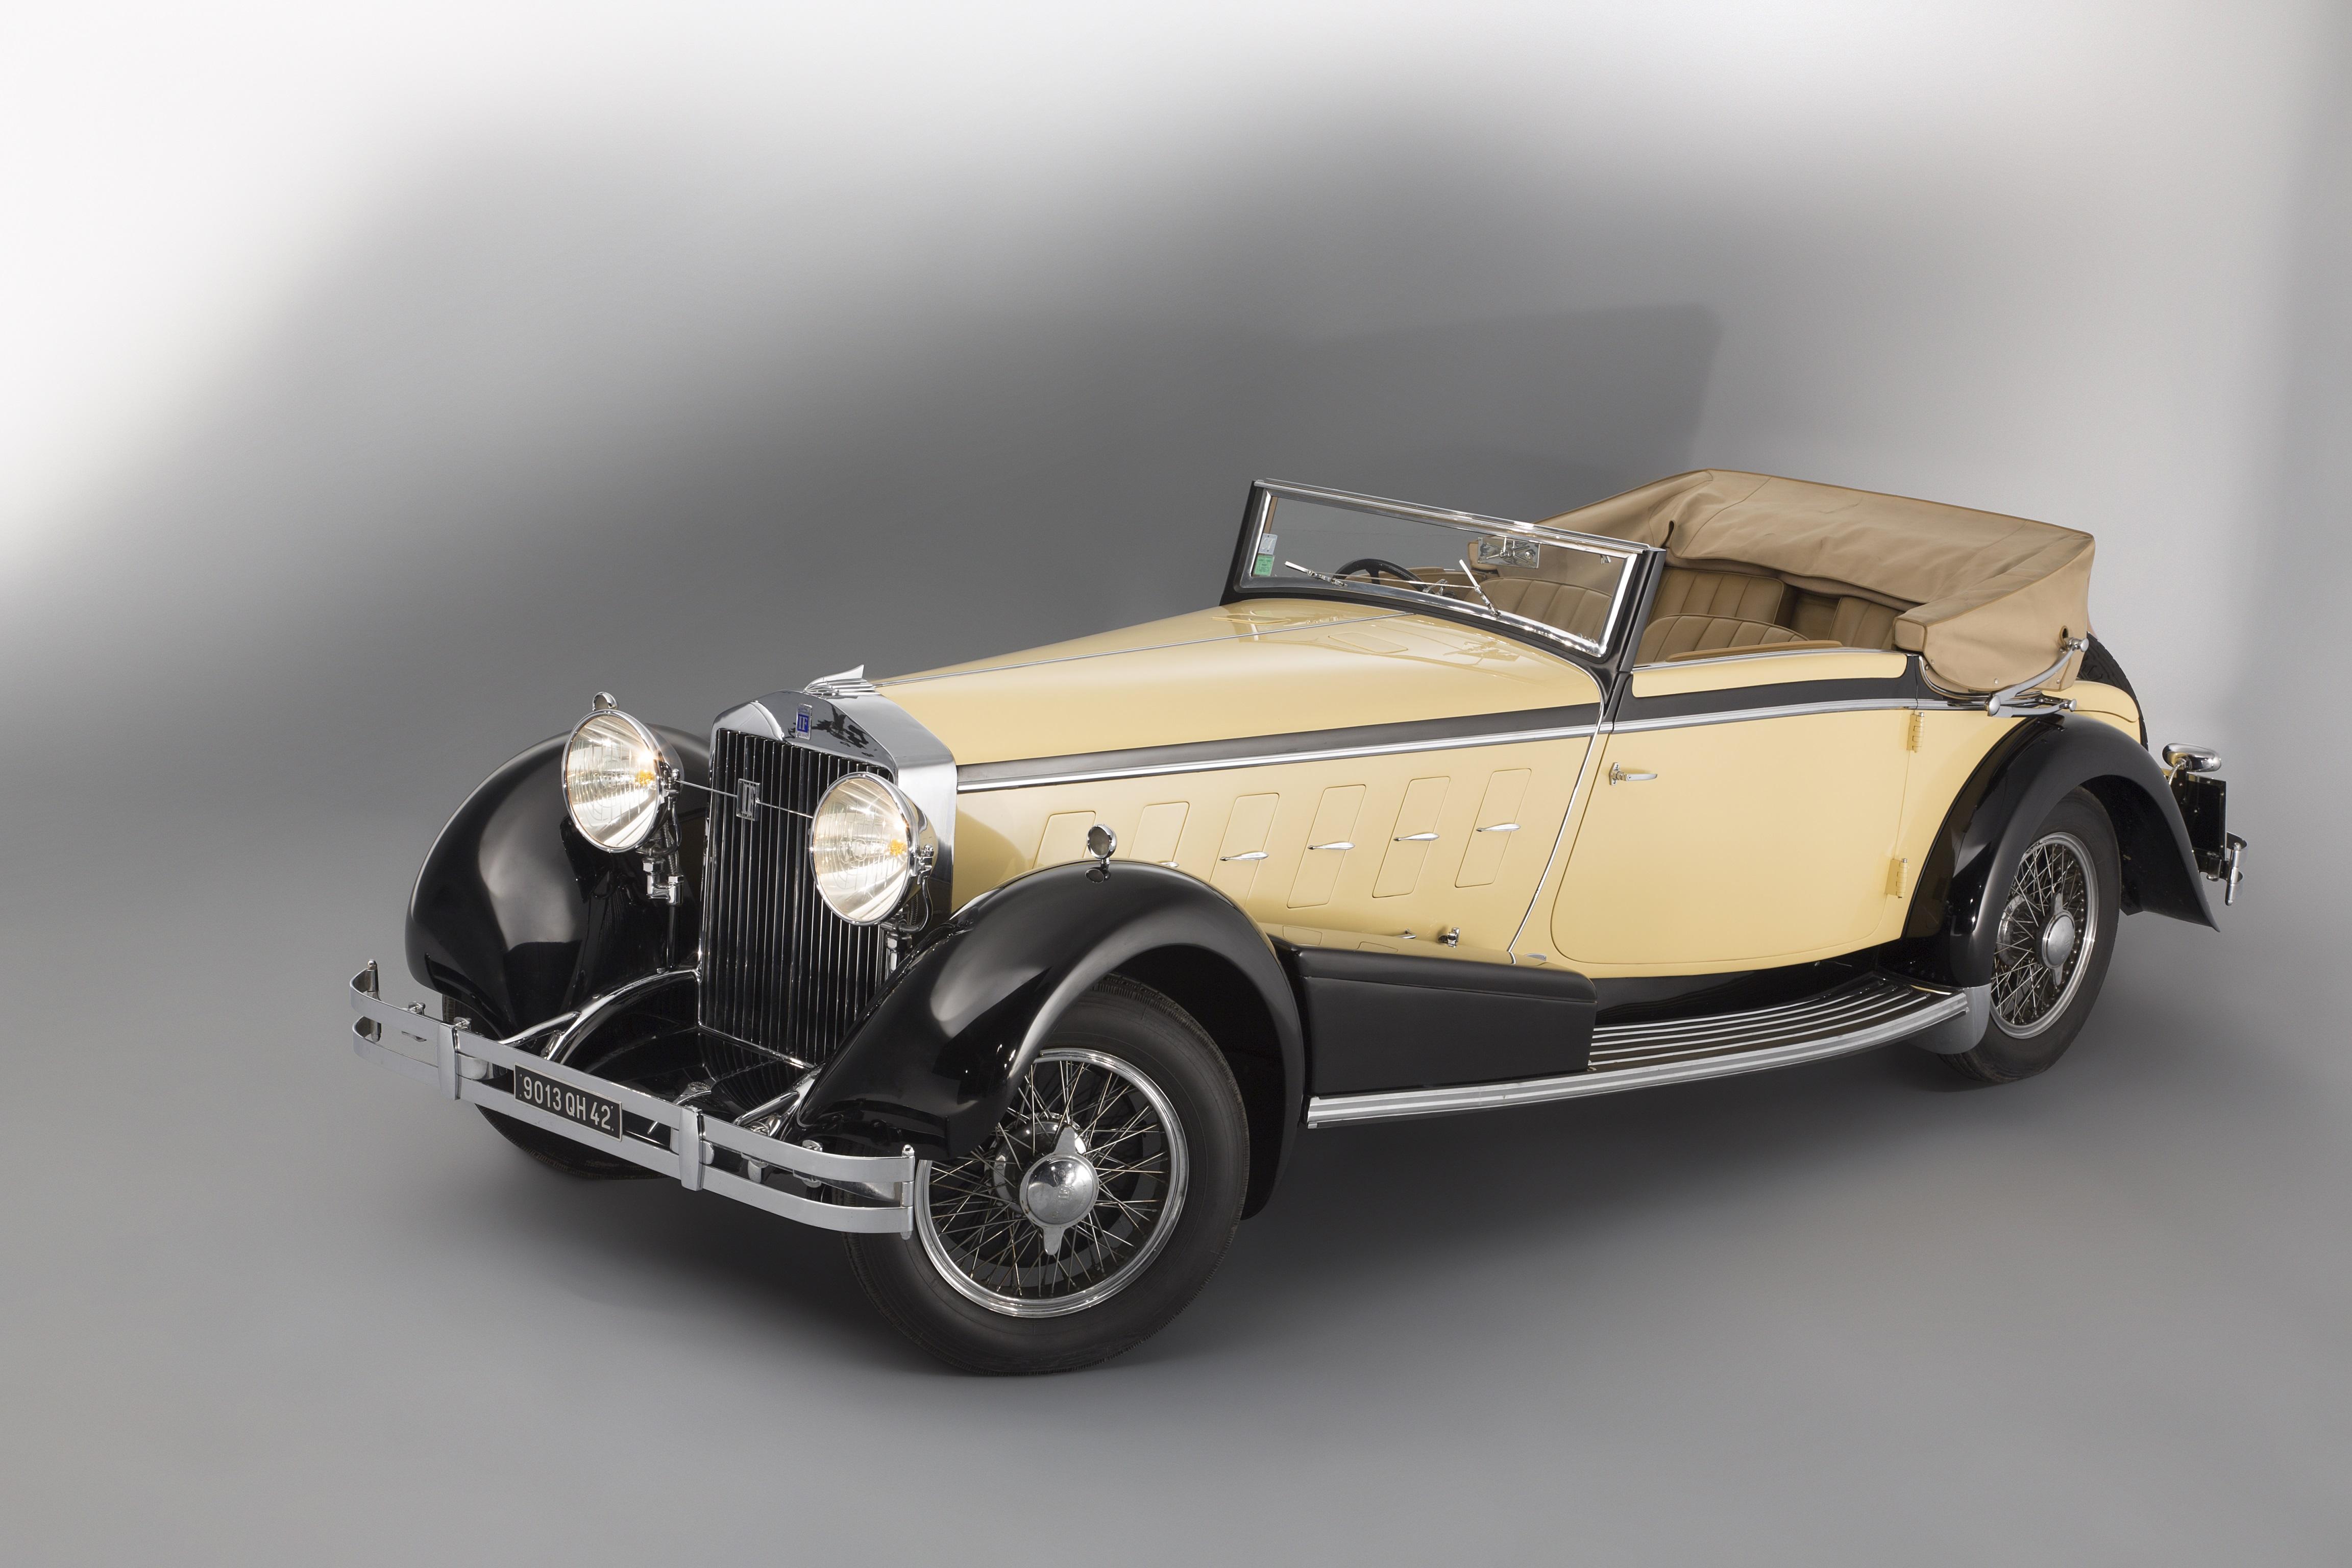 1924 Isotta Fraschini Model 8a Convertible By Ramseier